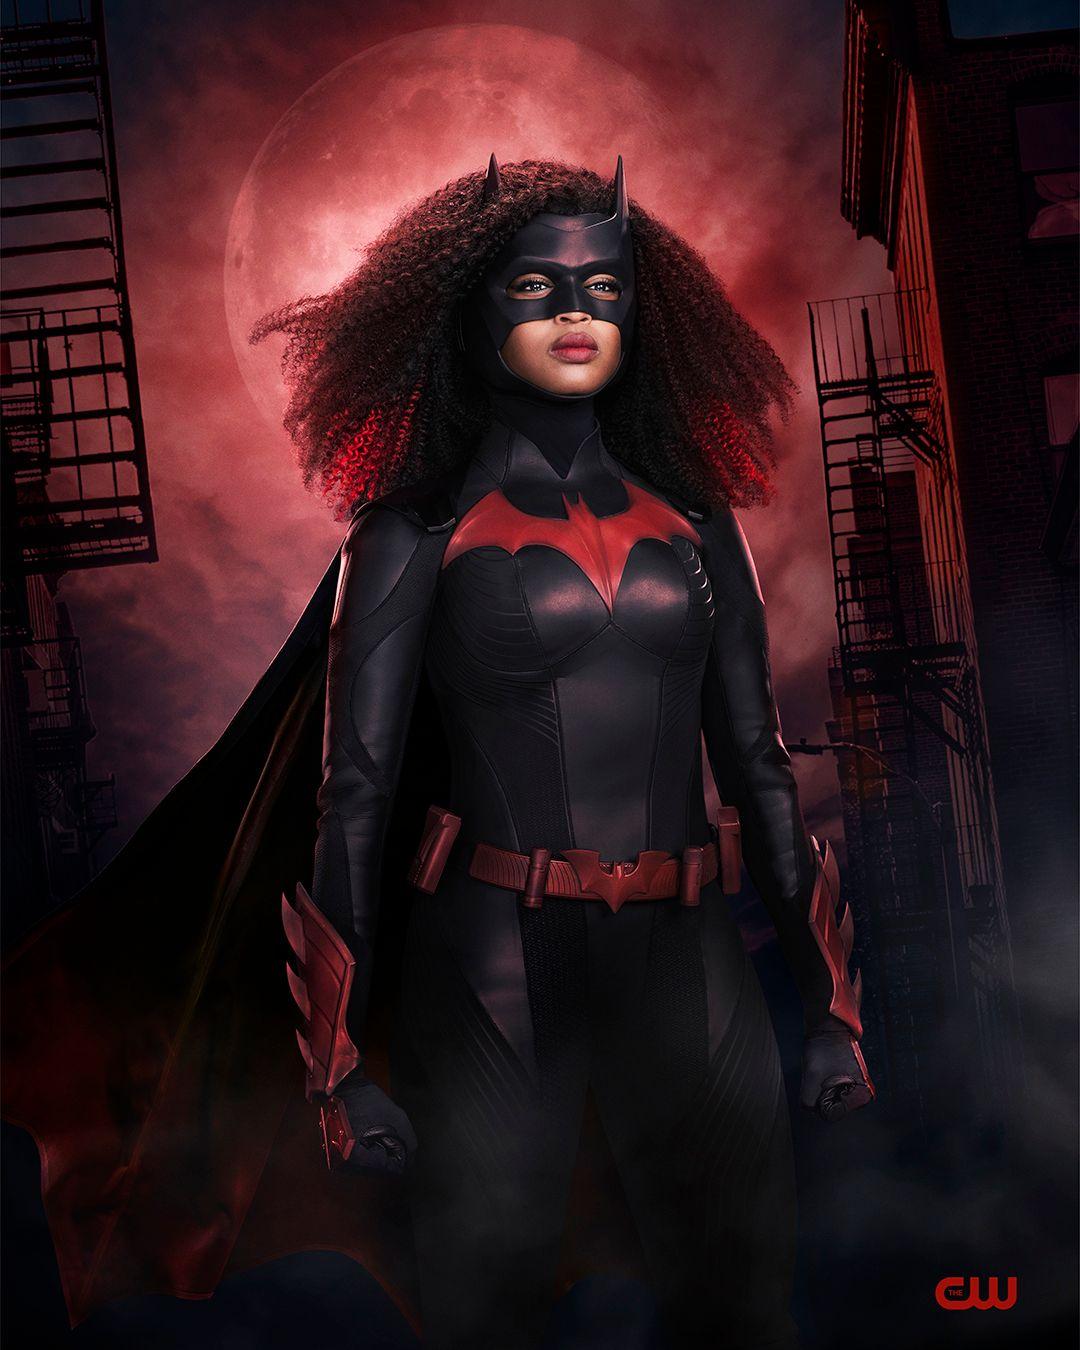 Batwoman Season 2 Images Reveal New Costume on Javicia ...